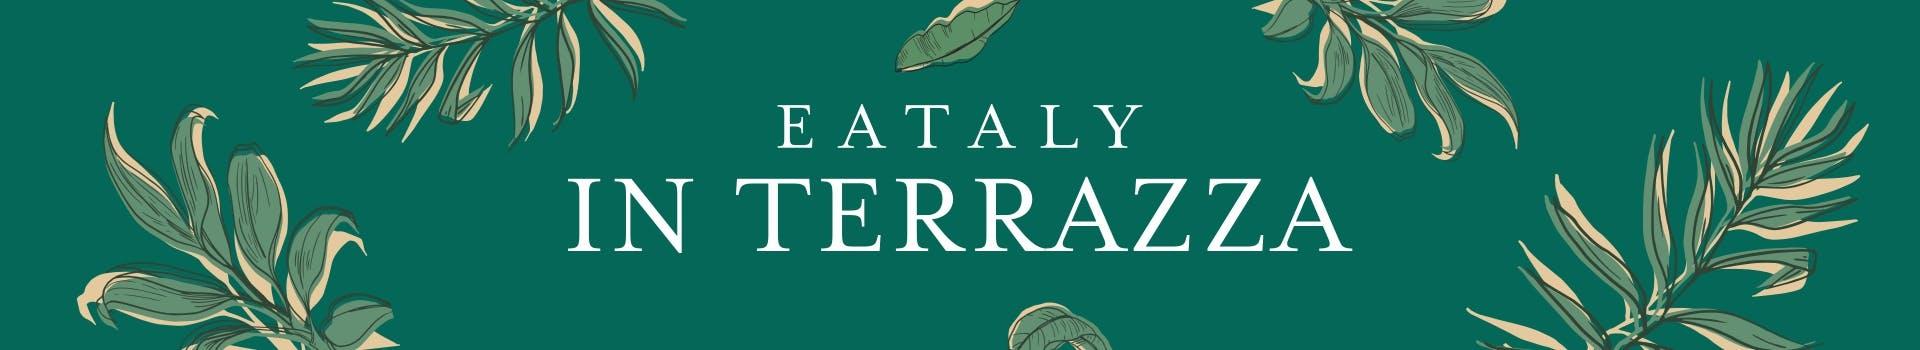 Eataly in Terrazza